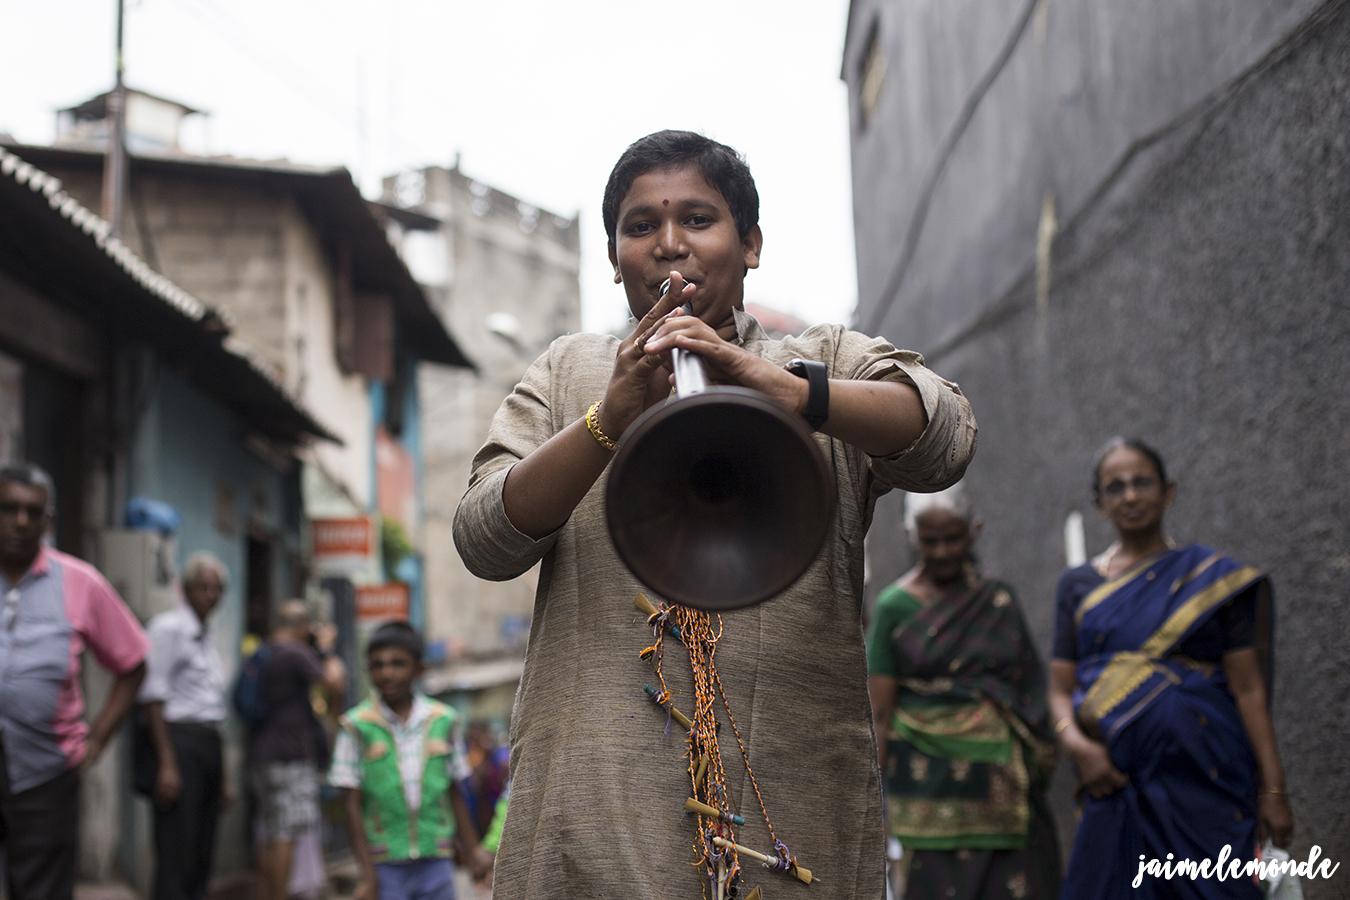 Portraits de voyage au Sri Lanka ©jaimelemonde (21)